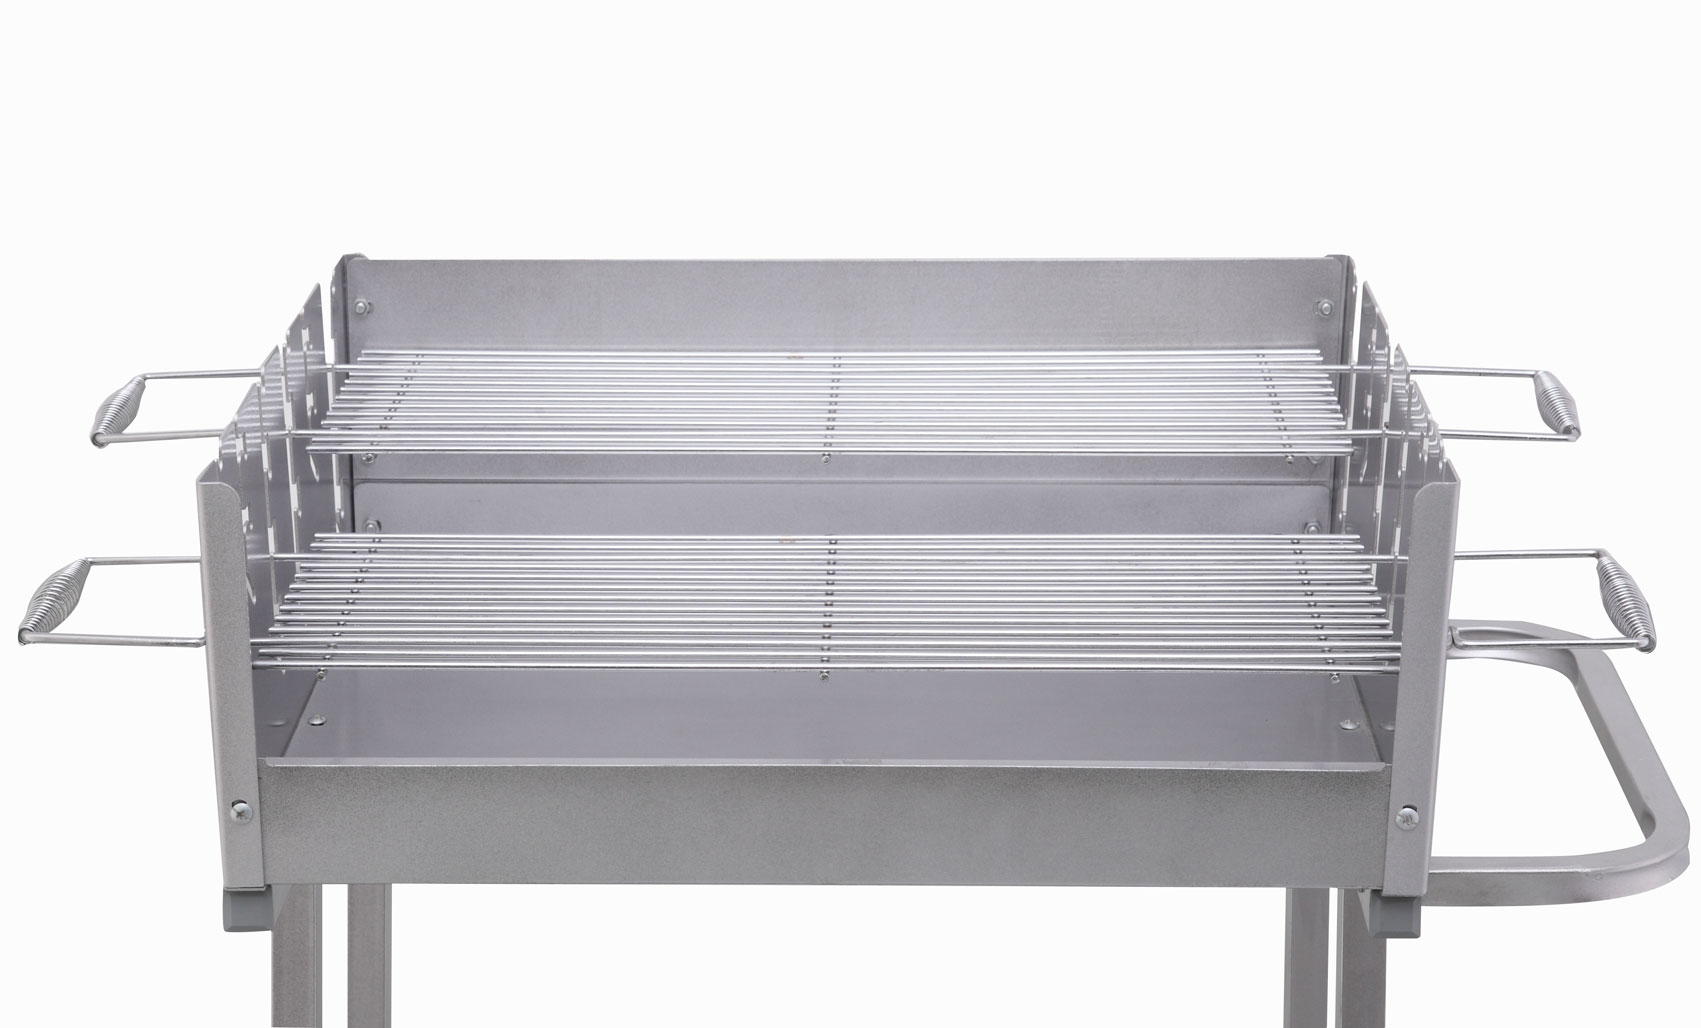 Tepro Holzkohlegrill / Grillwagen Pasadena Grillfläche 58x20,5cm Bild 3